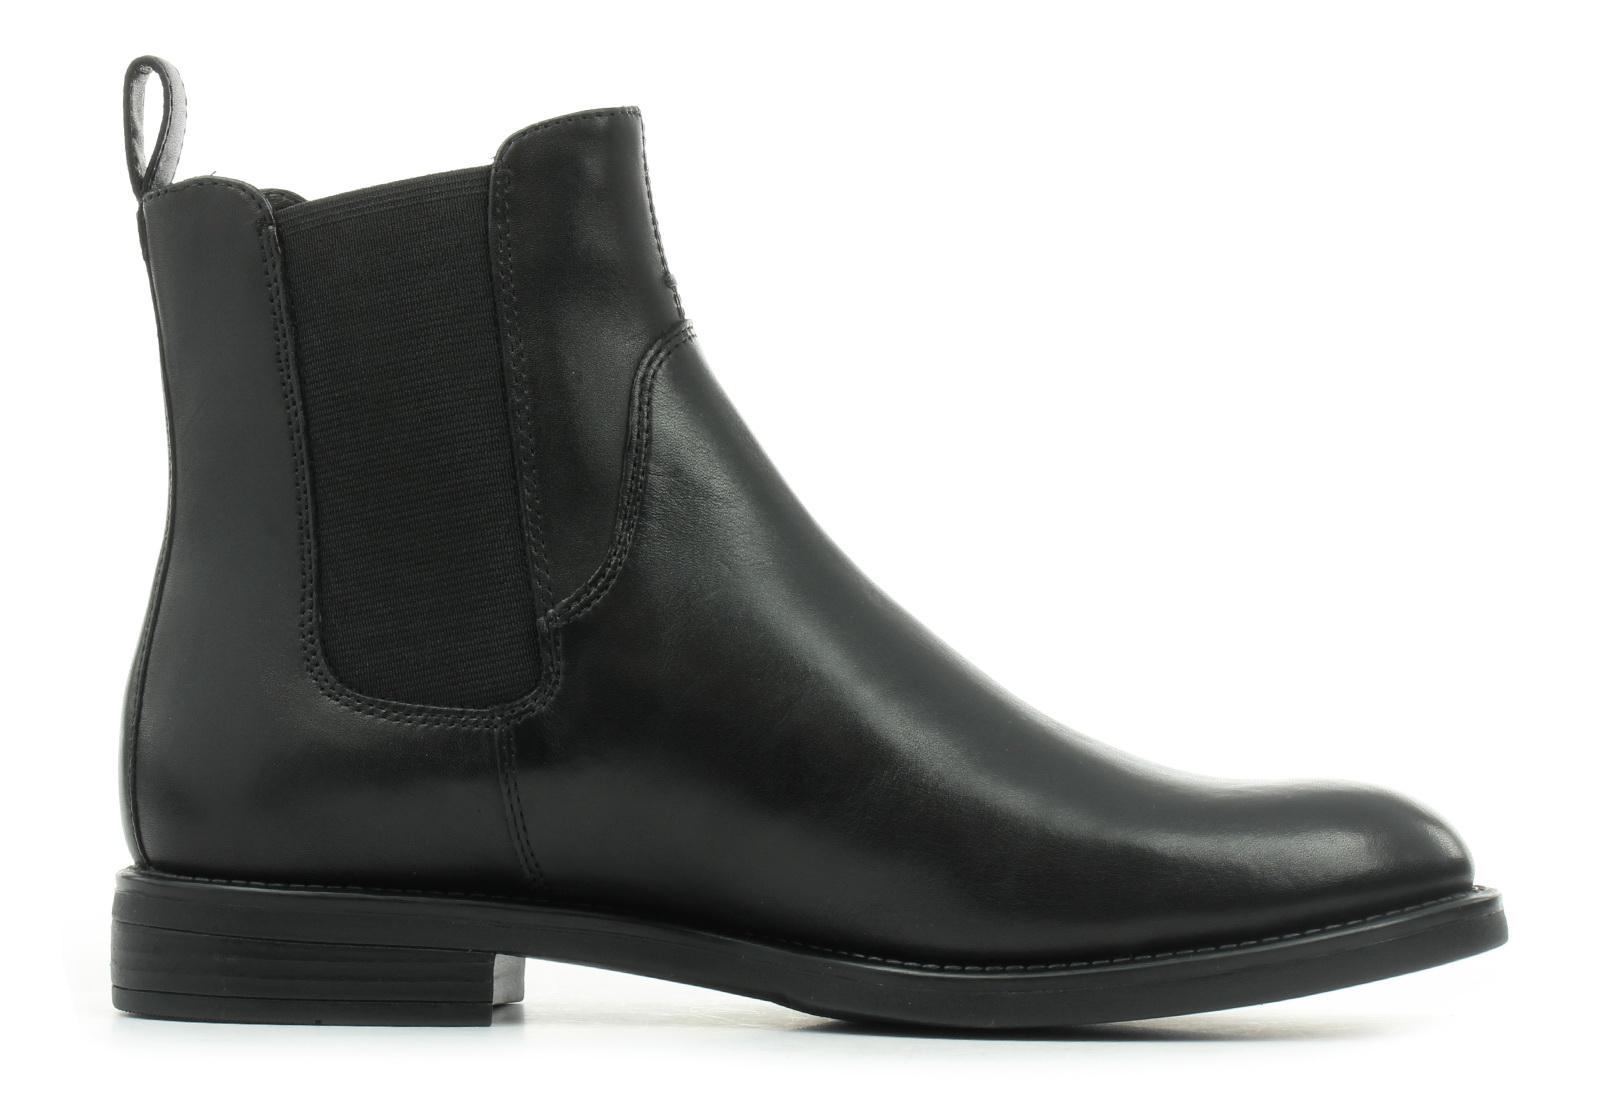 Vagabond Csizma Amina 4203 301 20 Office Shoes